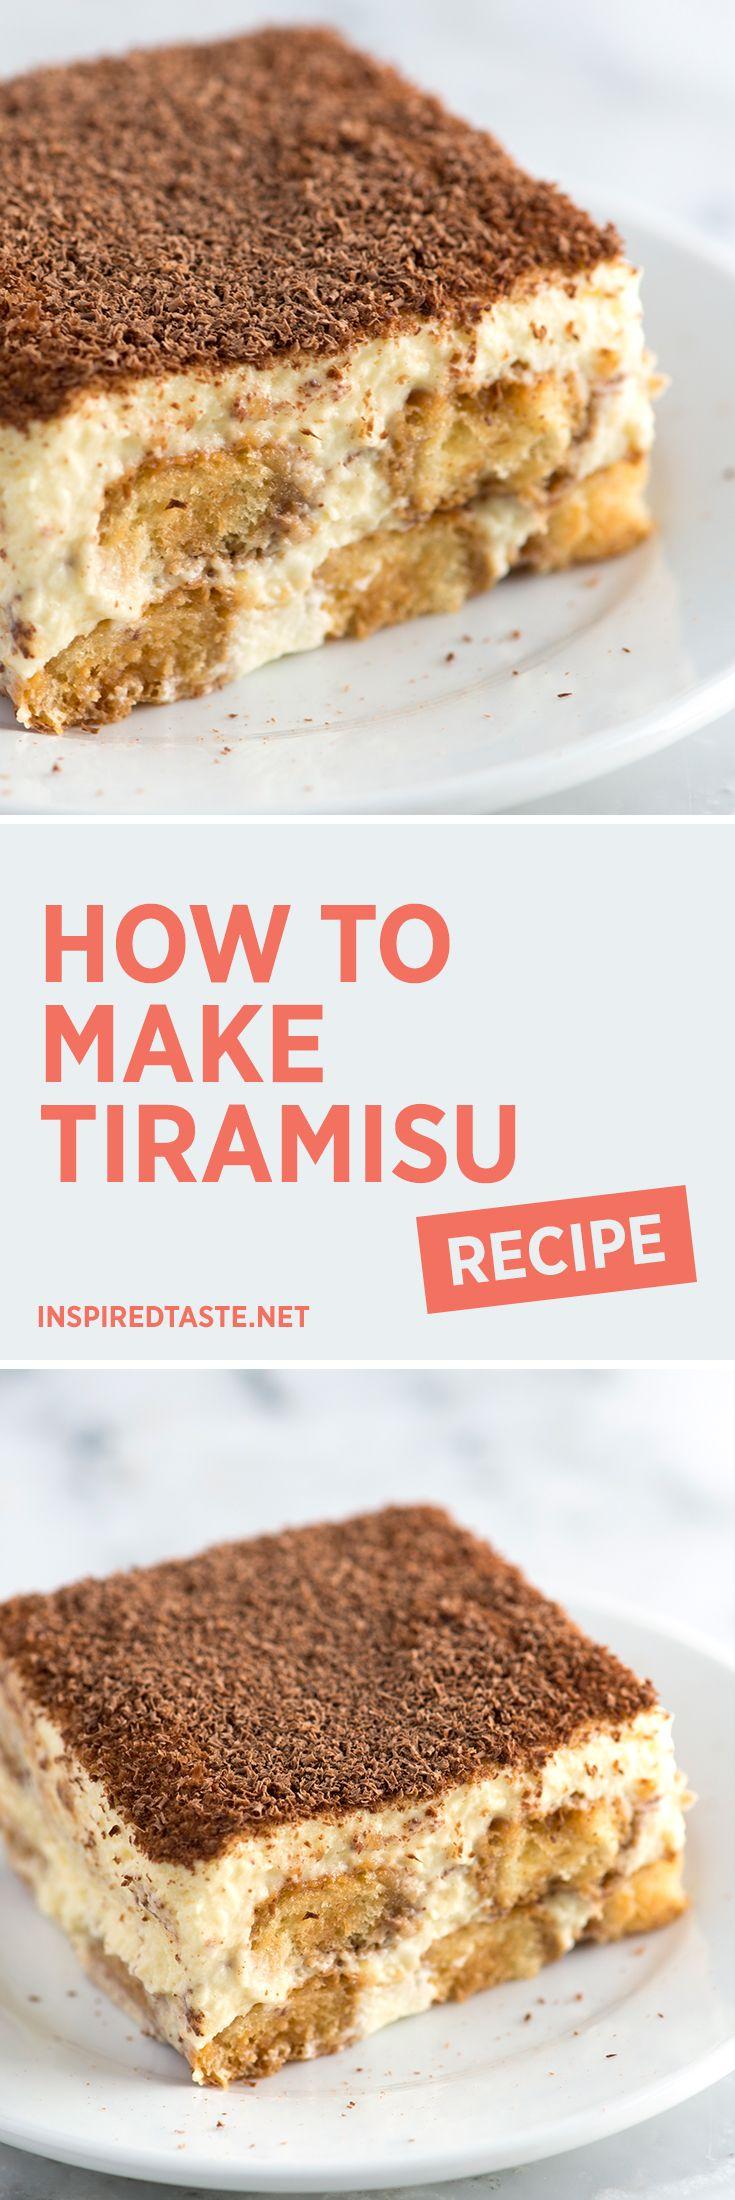 How to Make Tiramisu (Video + Recipe)